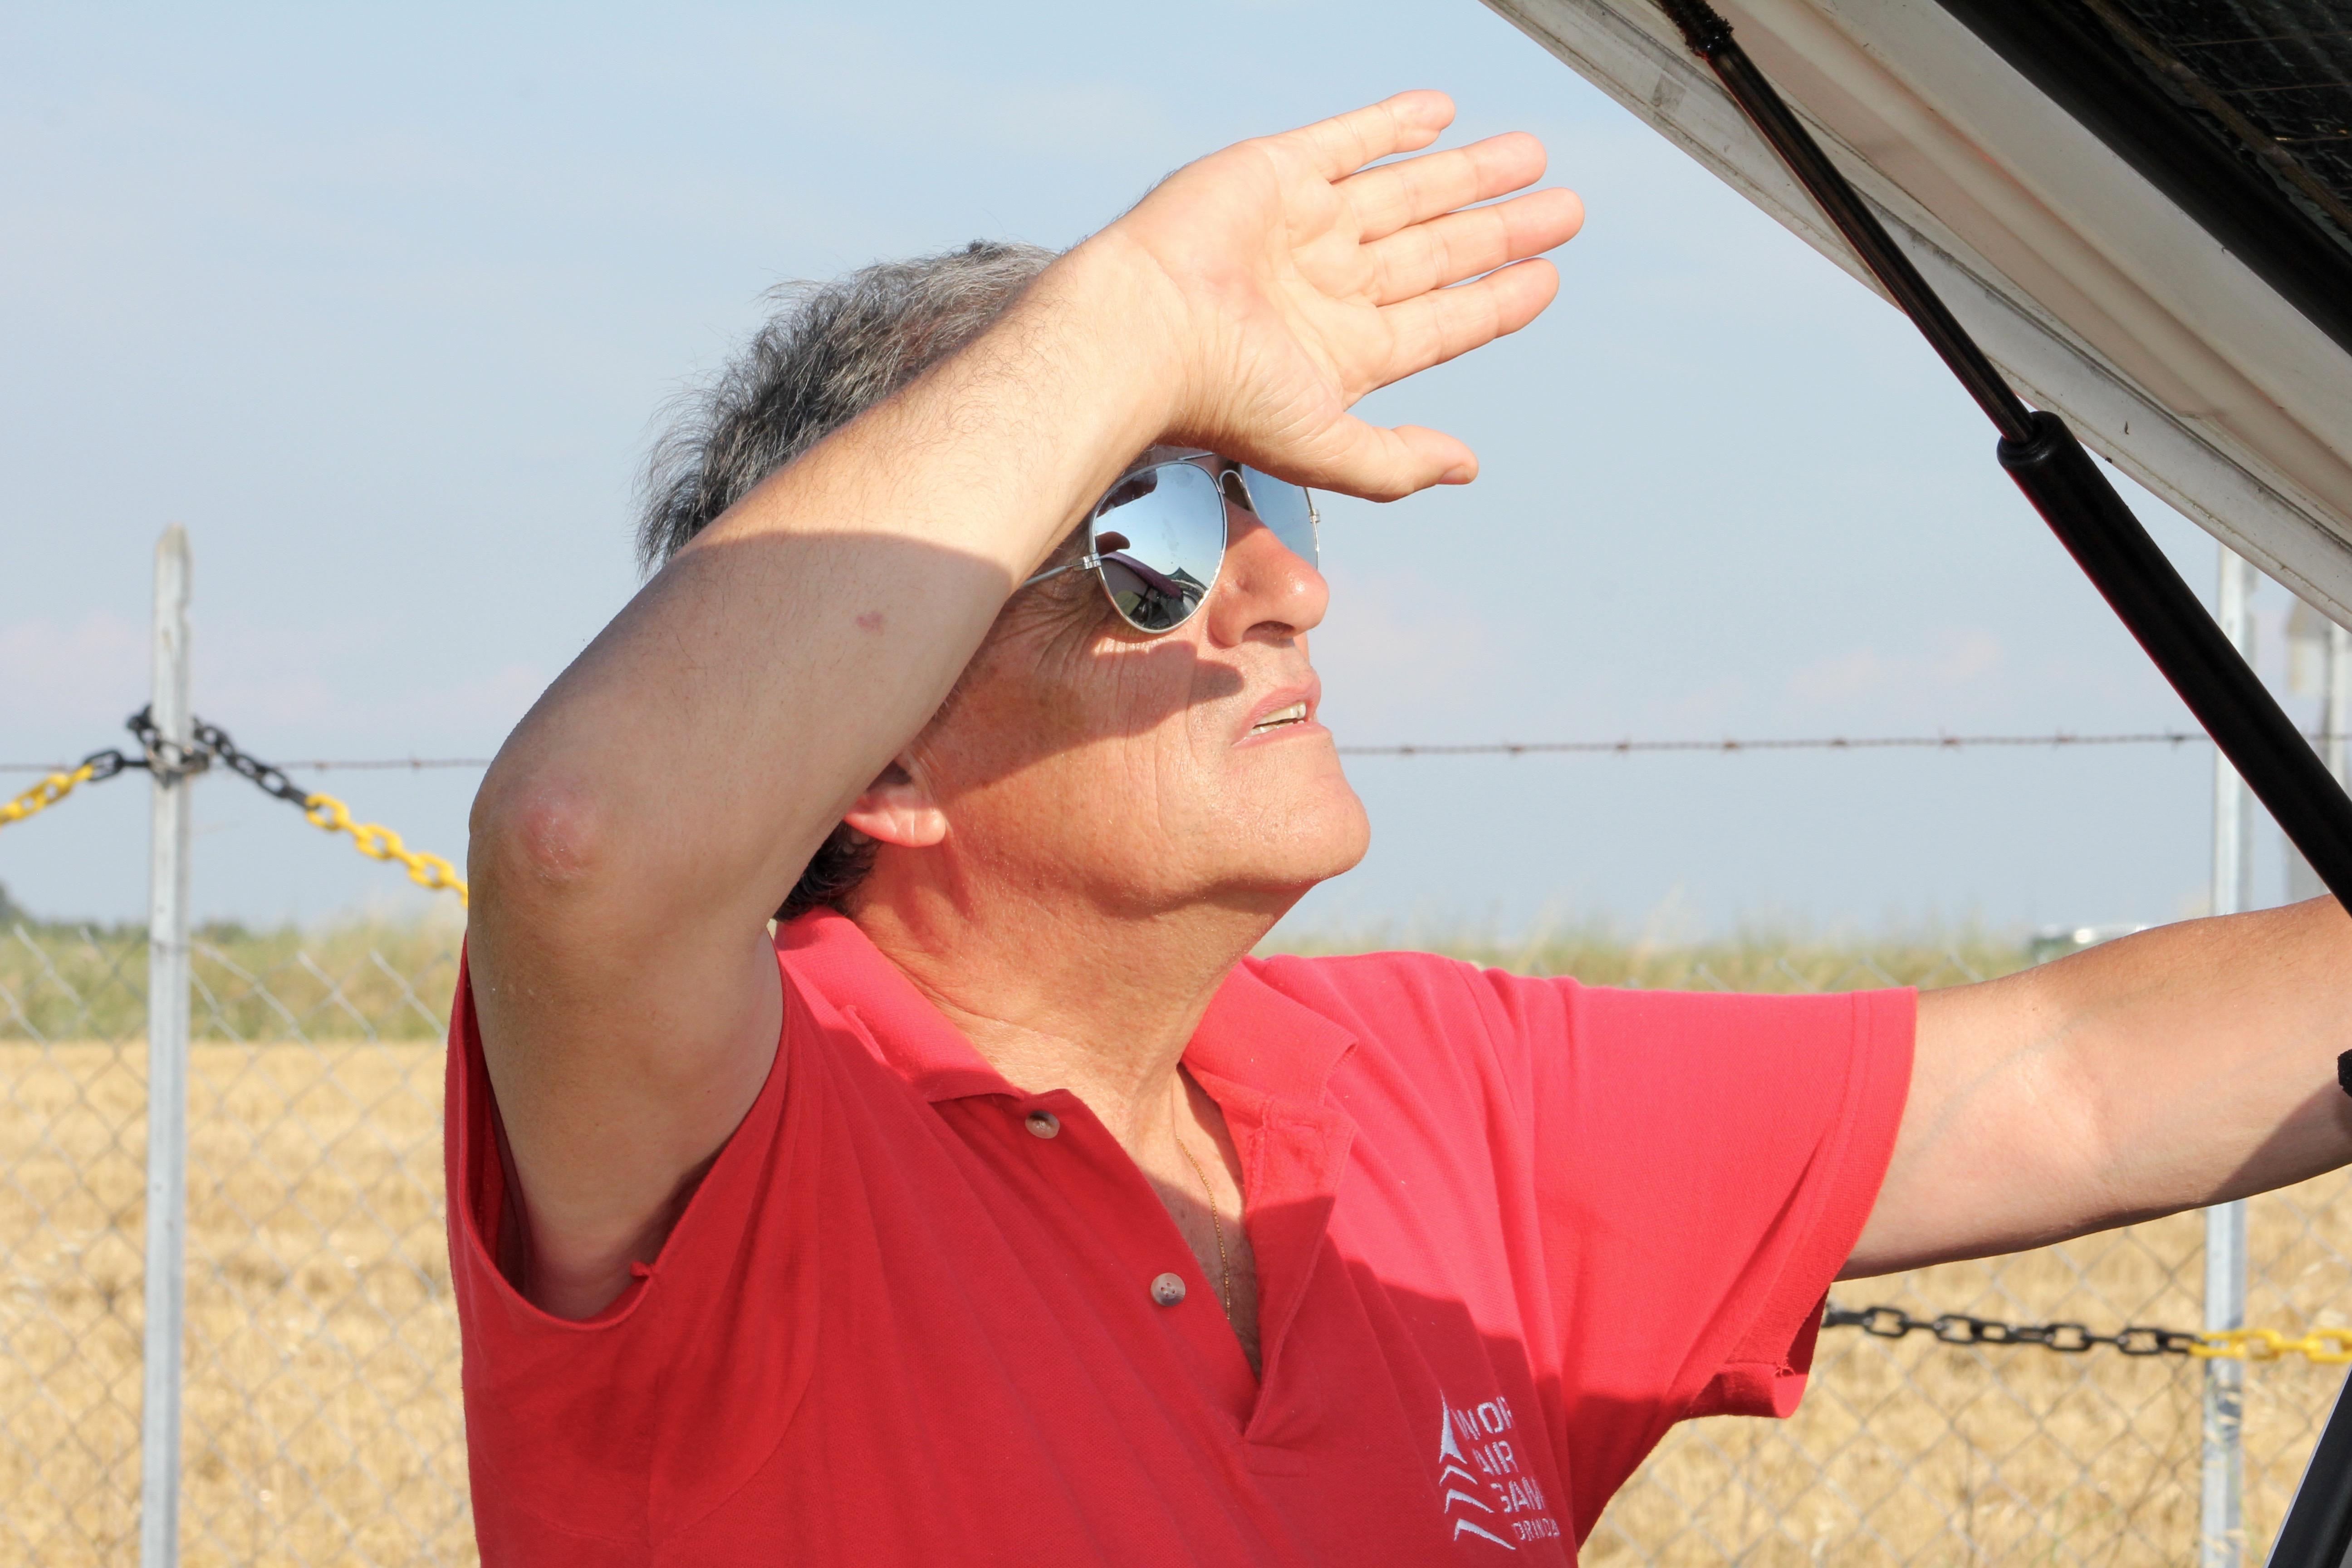 volo acrobatico: Paolo Spolverini